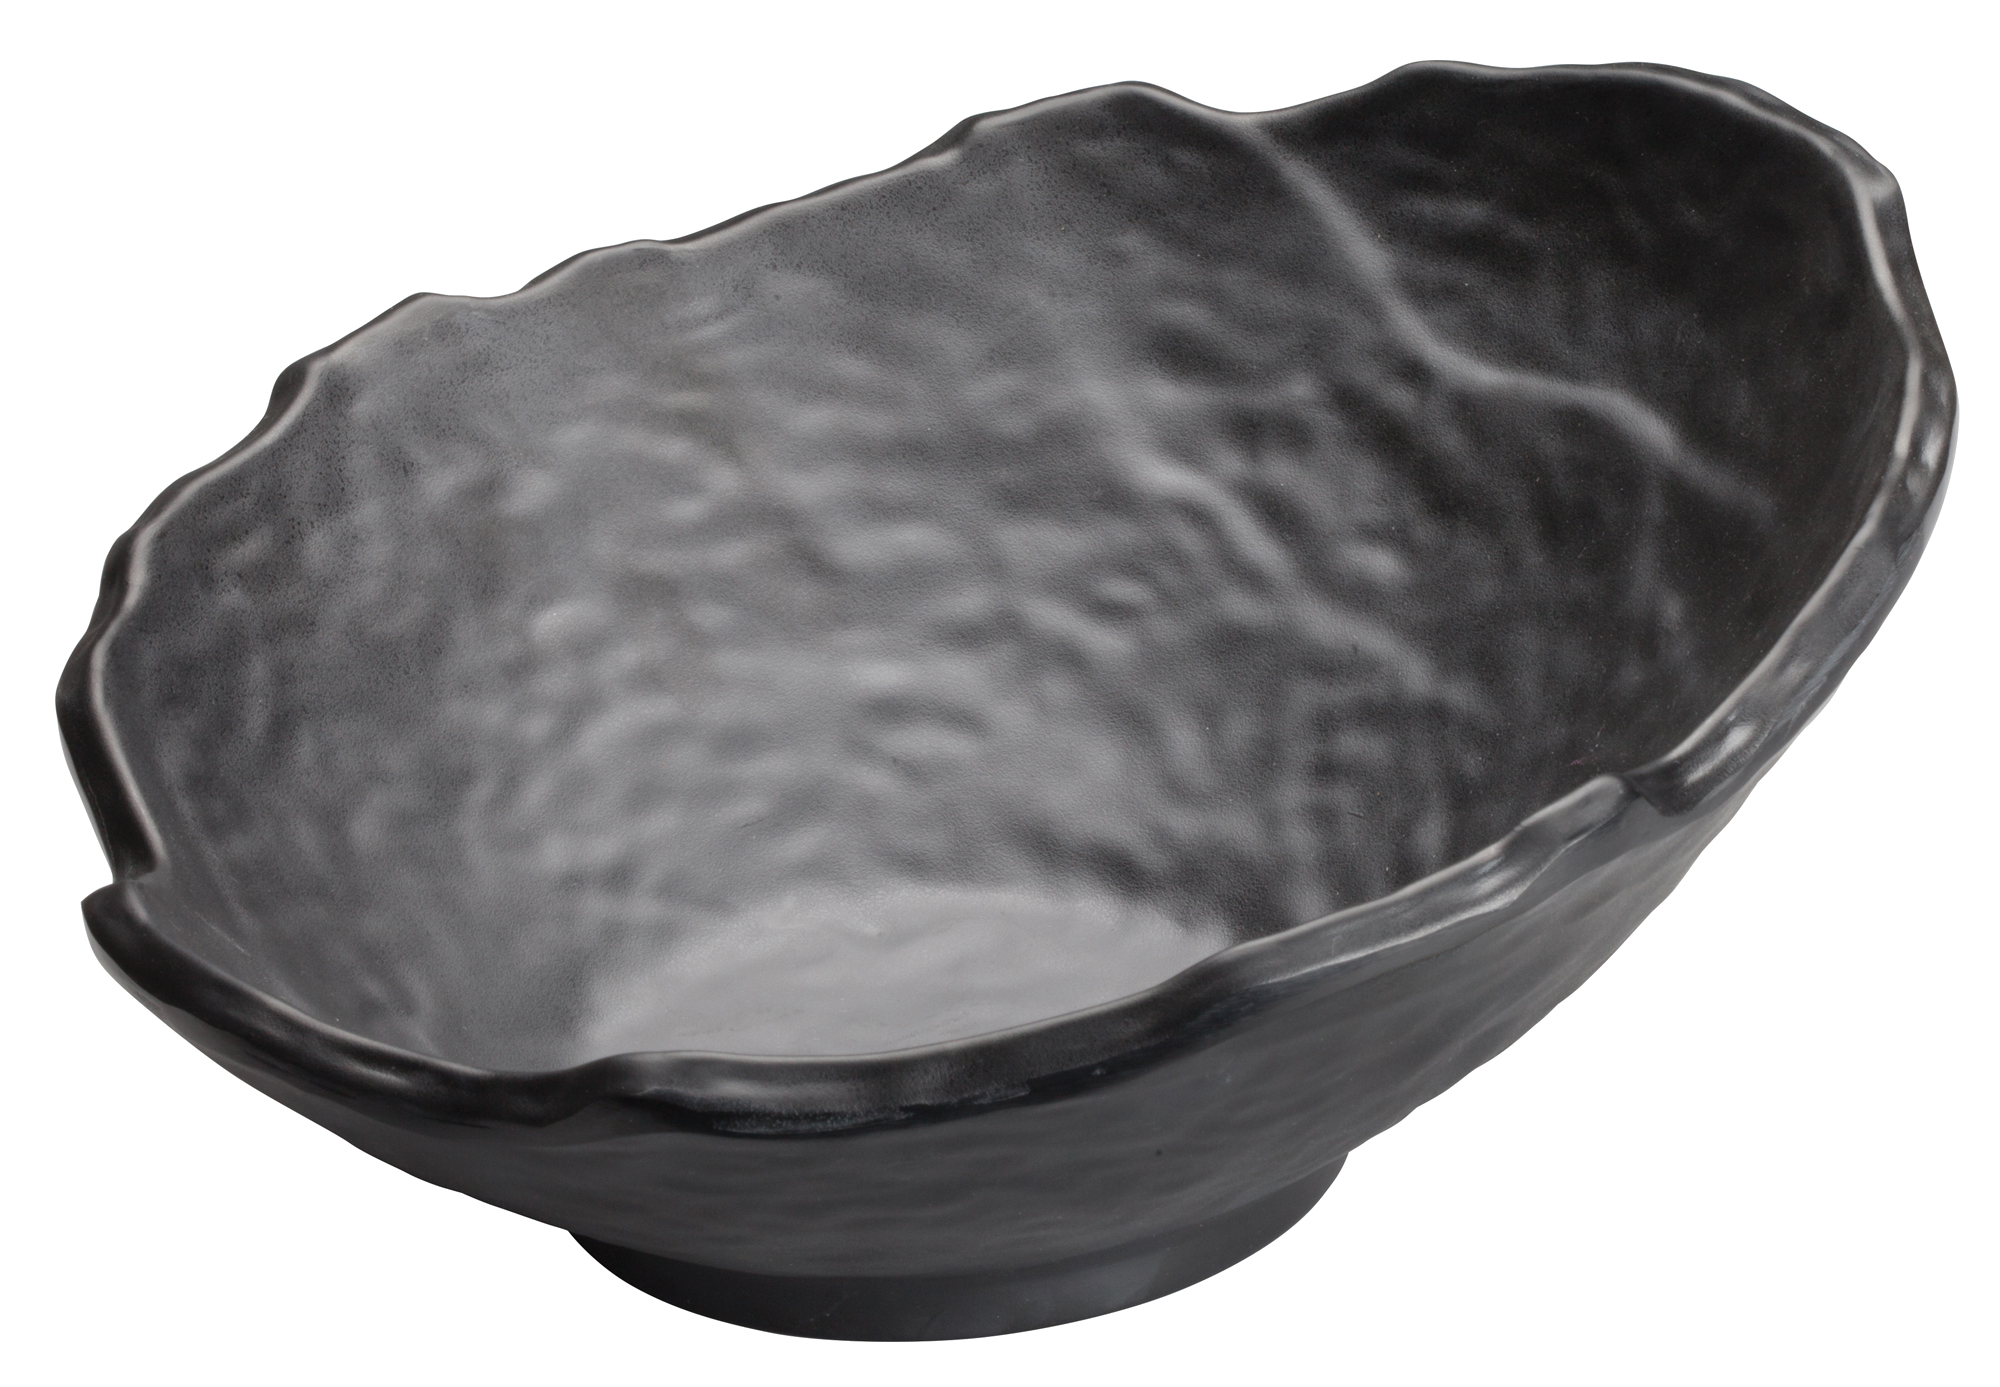 Winco WDM019-309 bowl, plastic,  1 - 2 qt (32 - 95 oz)